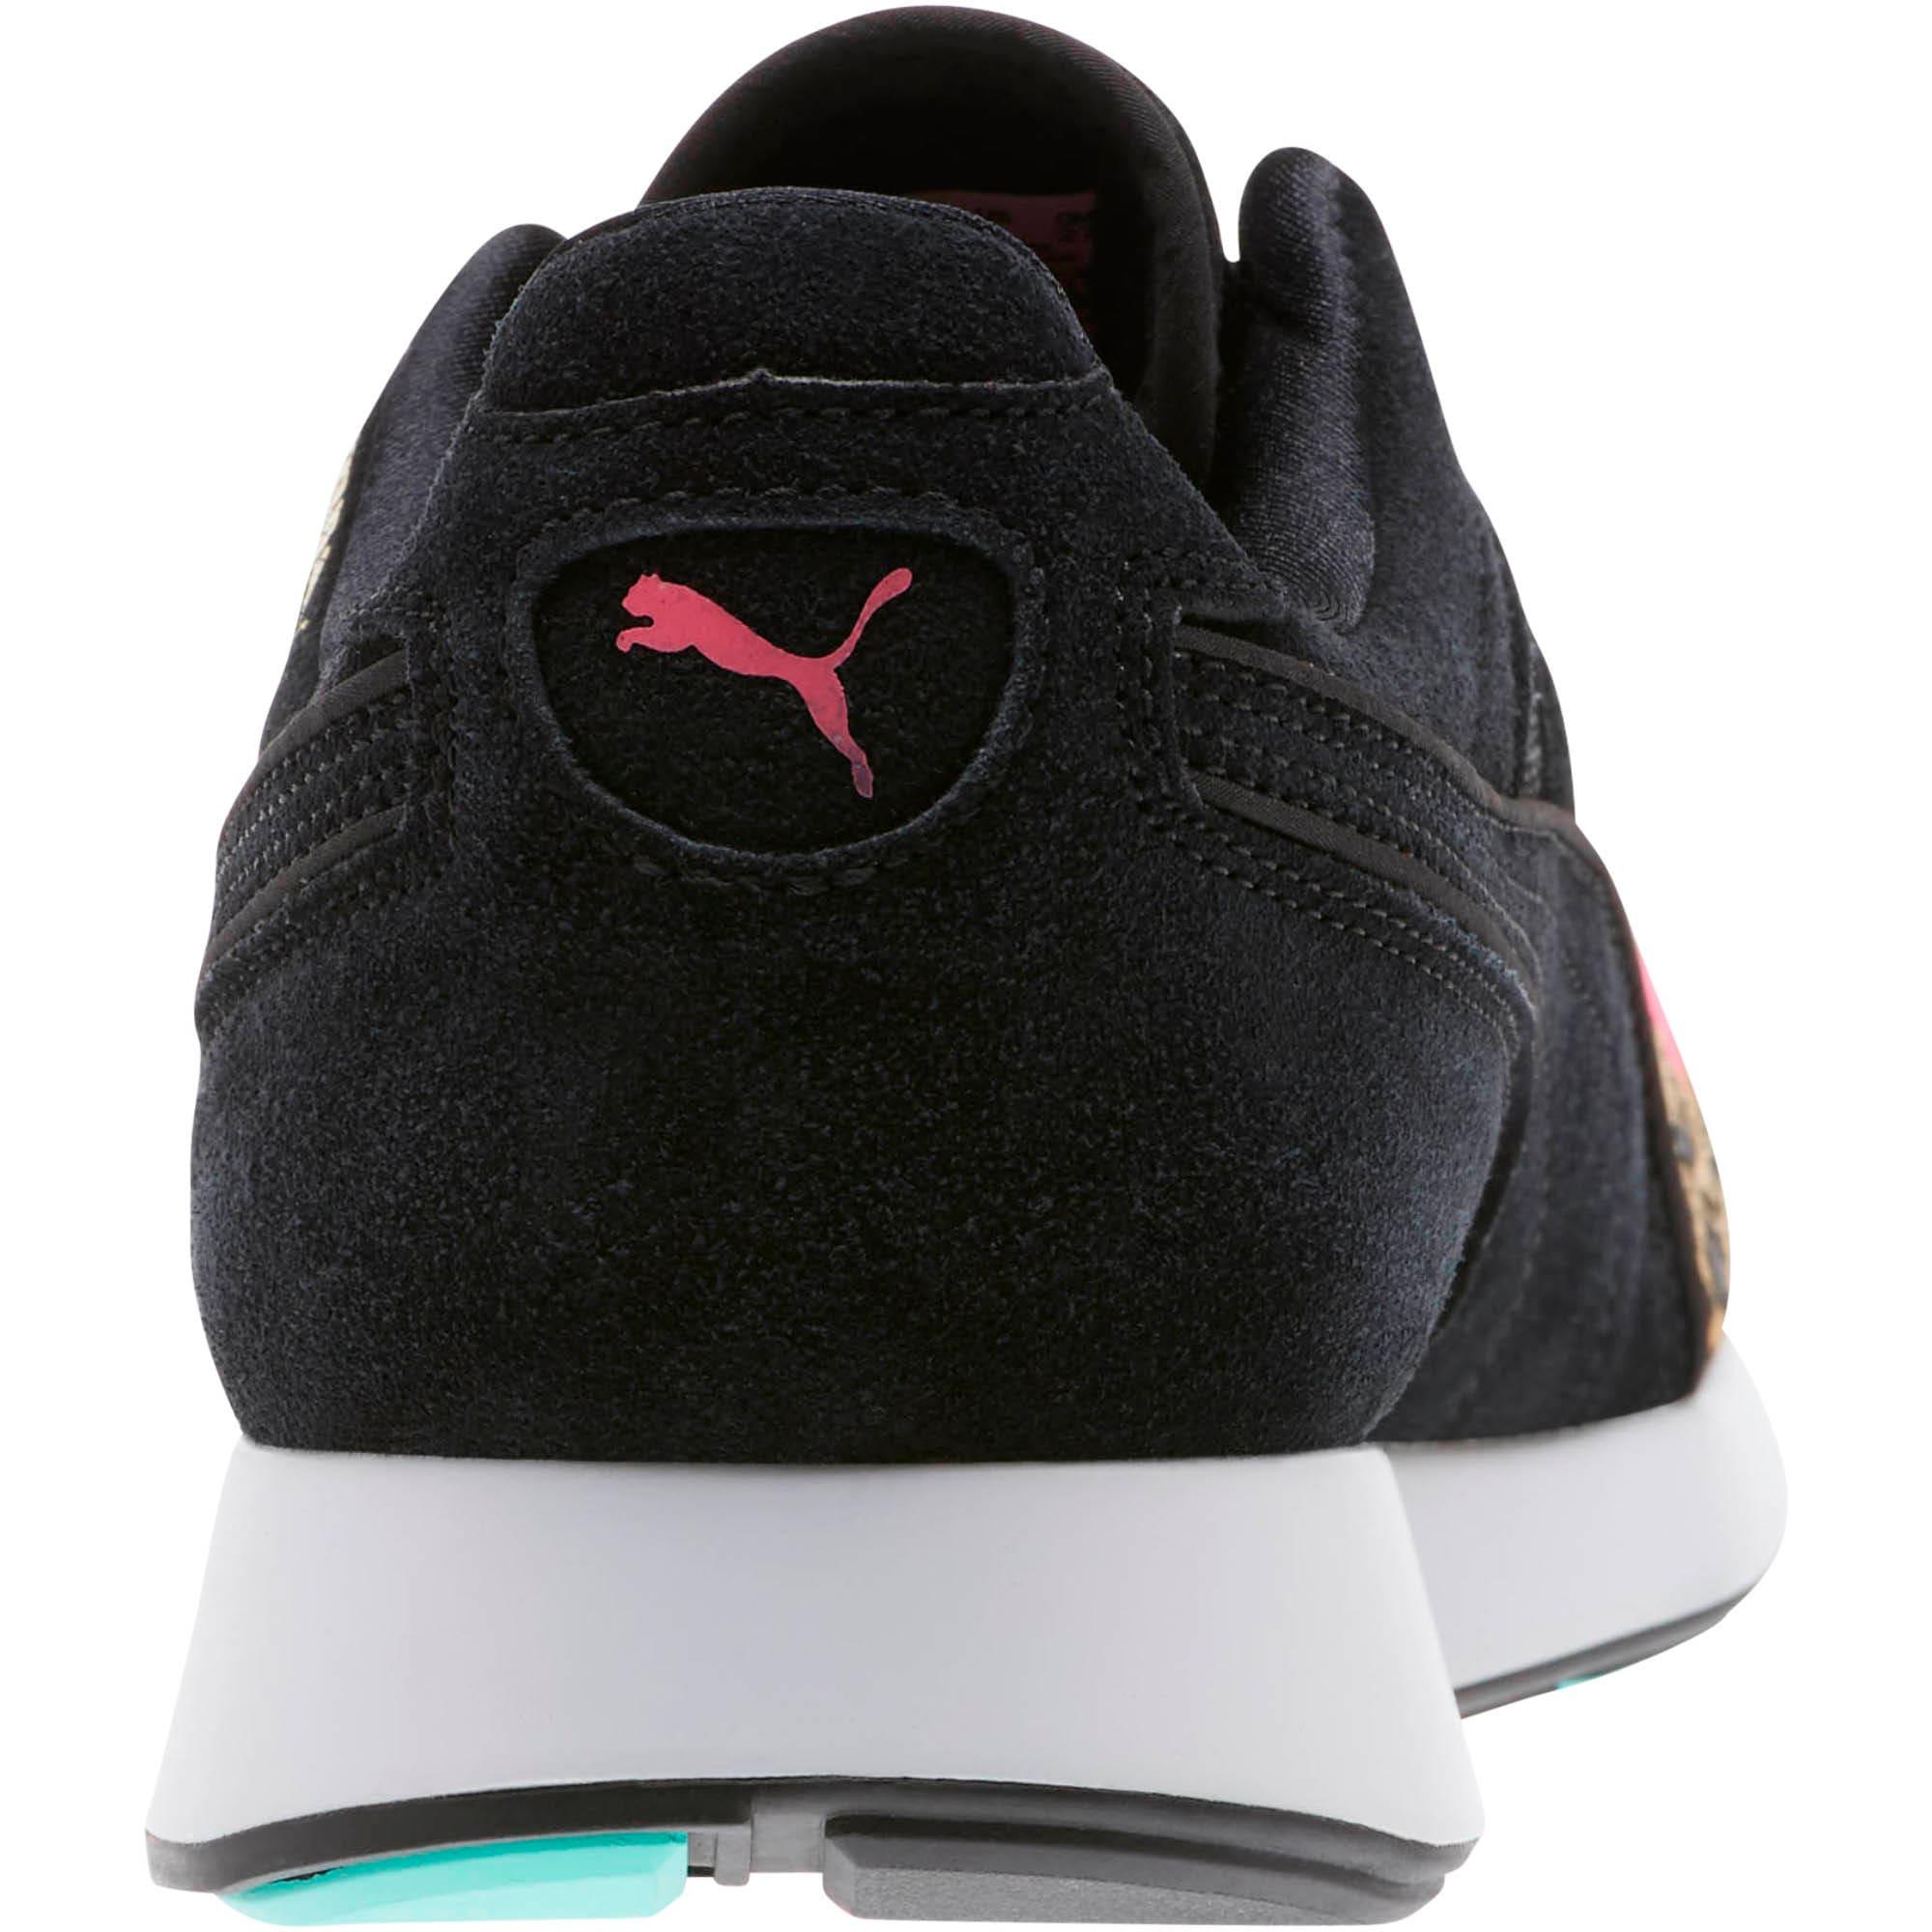 Thumbnail 4 of RS-100 Party Cheetah Sneakers, KNOCKOUT PINK-Puma Black, medium